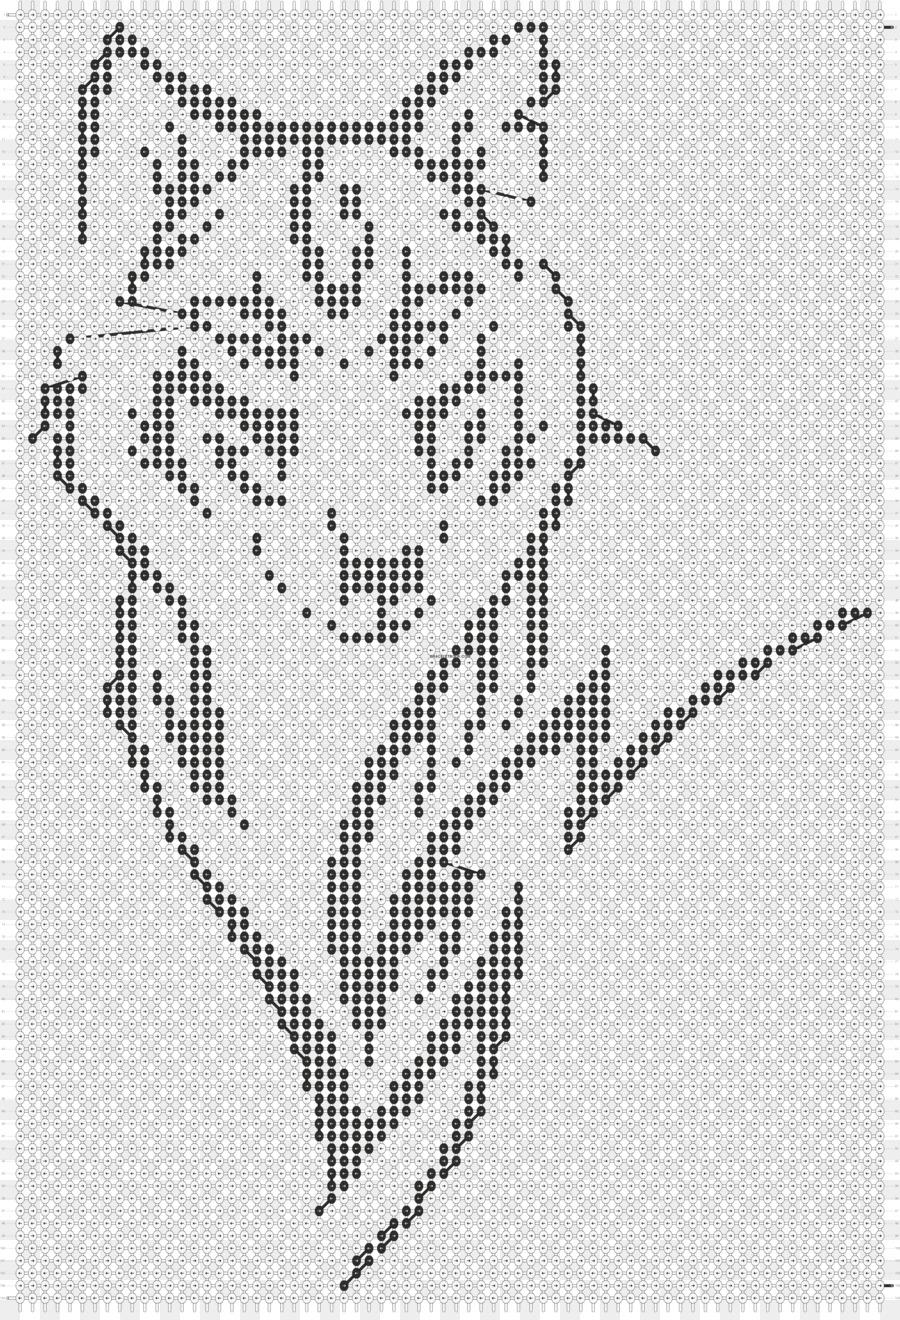 Sleeve tattoo Gray wolf - Filet Crochet 3756*5480 transprent Png ...